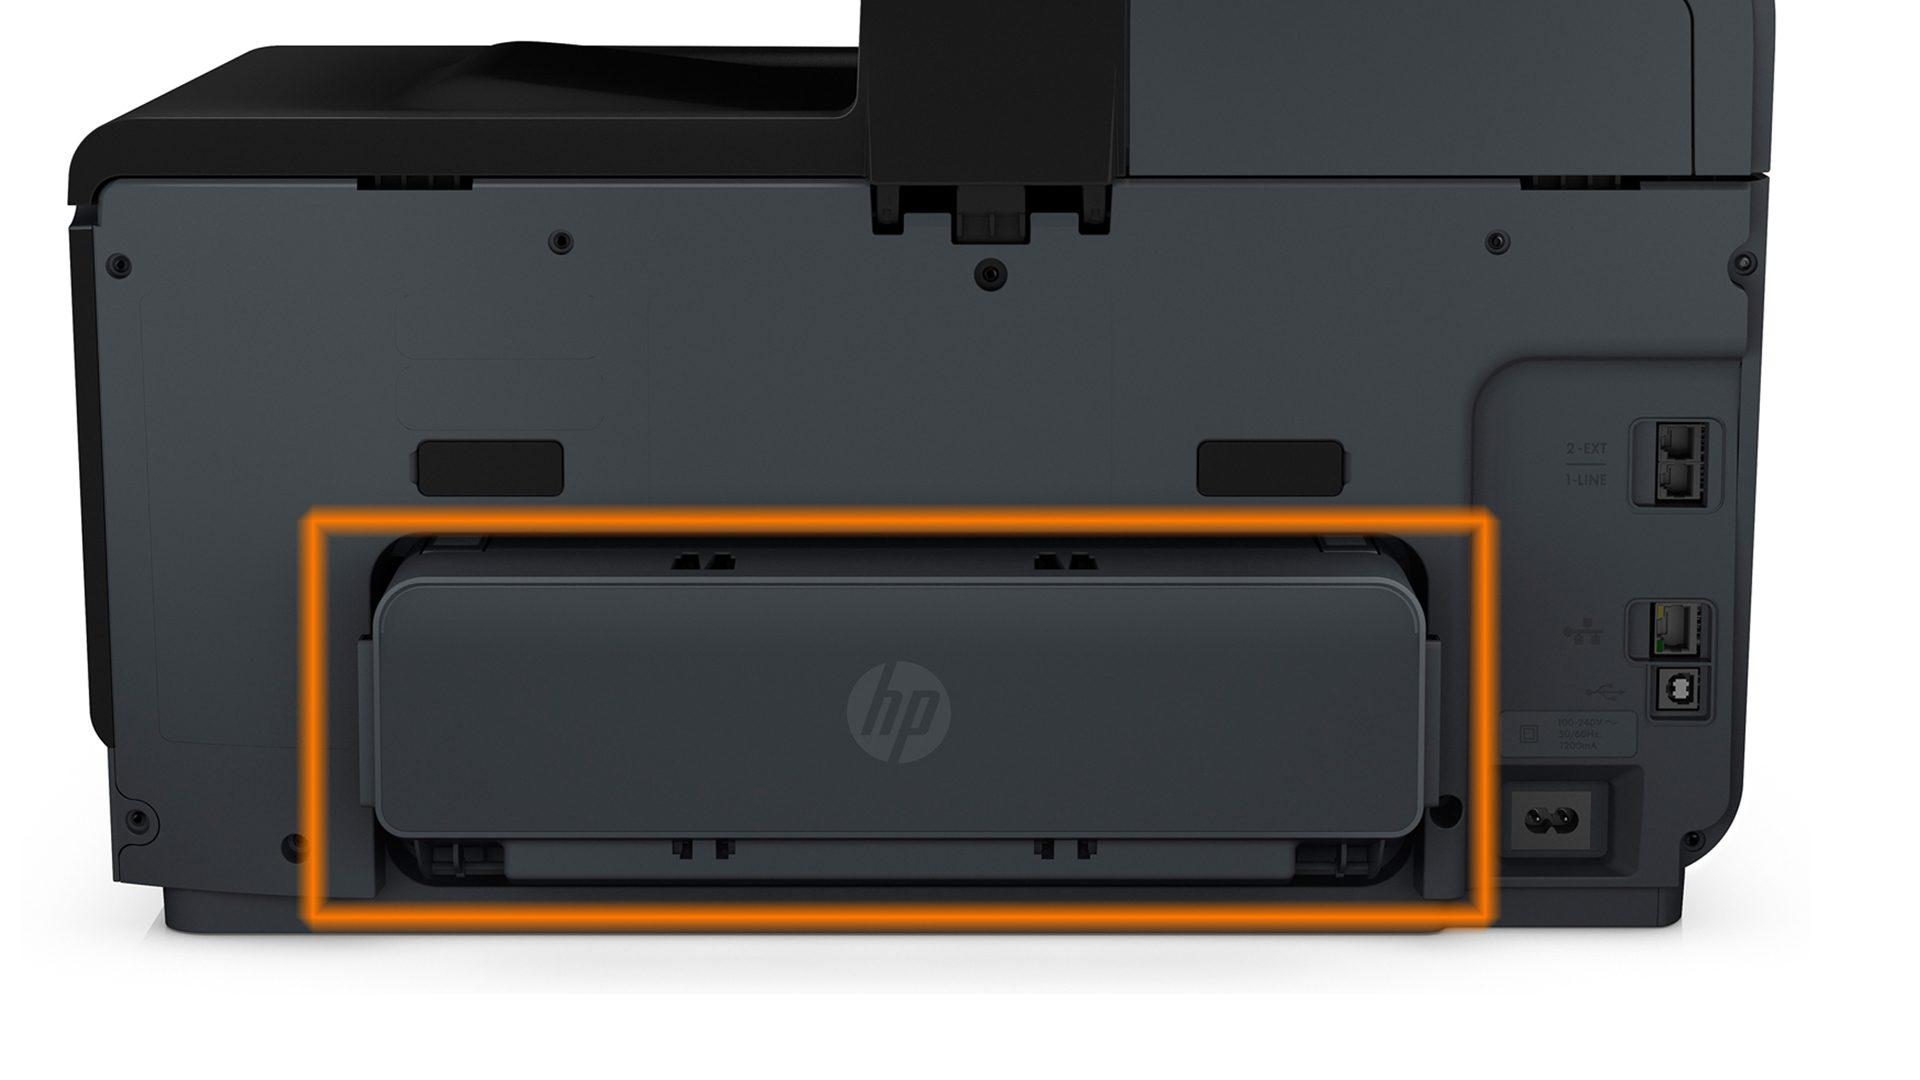 HP Officejet Pro 8620 – Duplexeinheit am Drucker